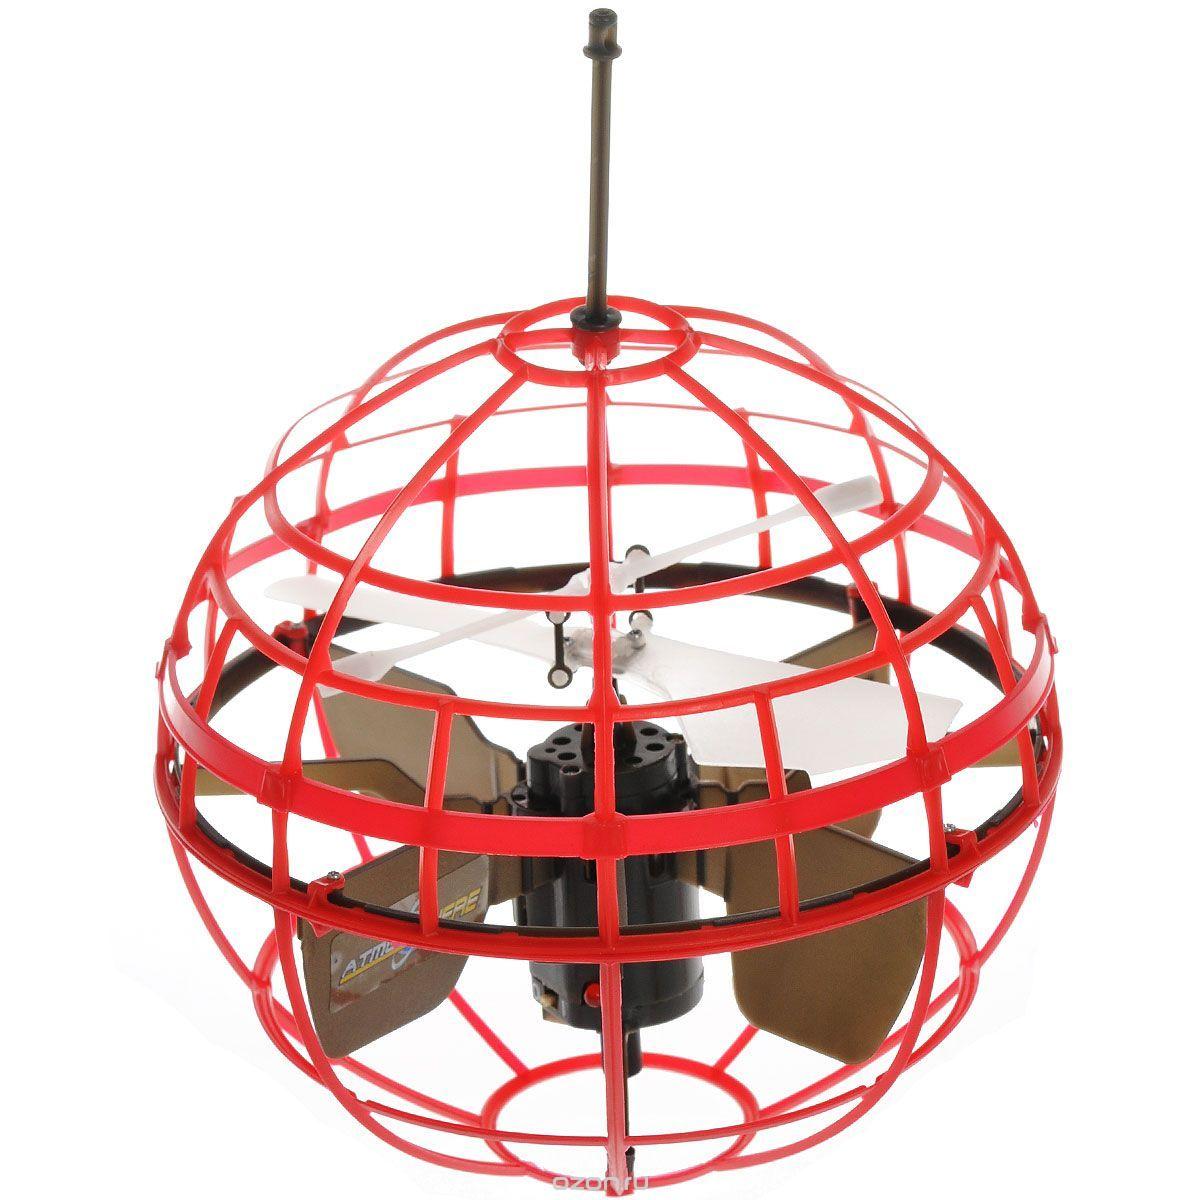 Air Hogs Игрушка на радиоуправлении Atmosphere Axis цвет красный - Радиоуправляемые игрушки